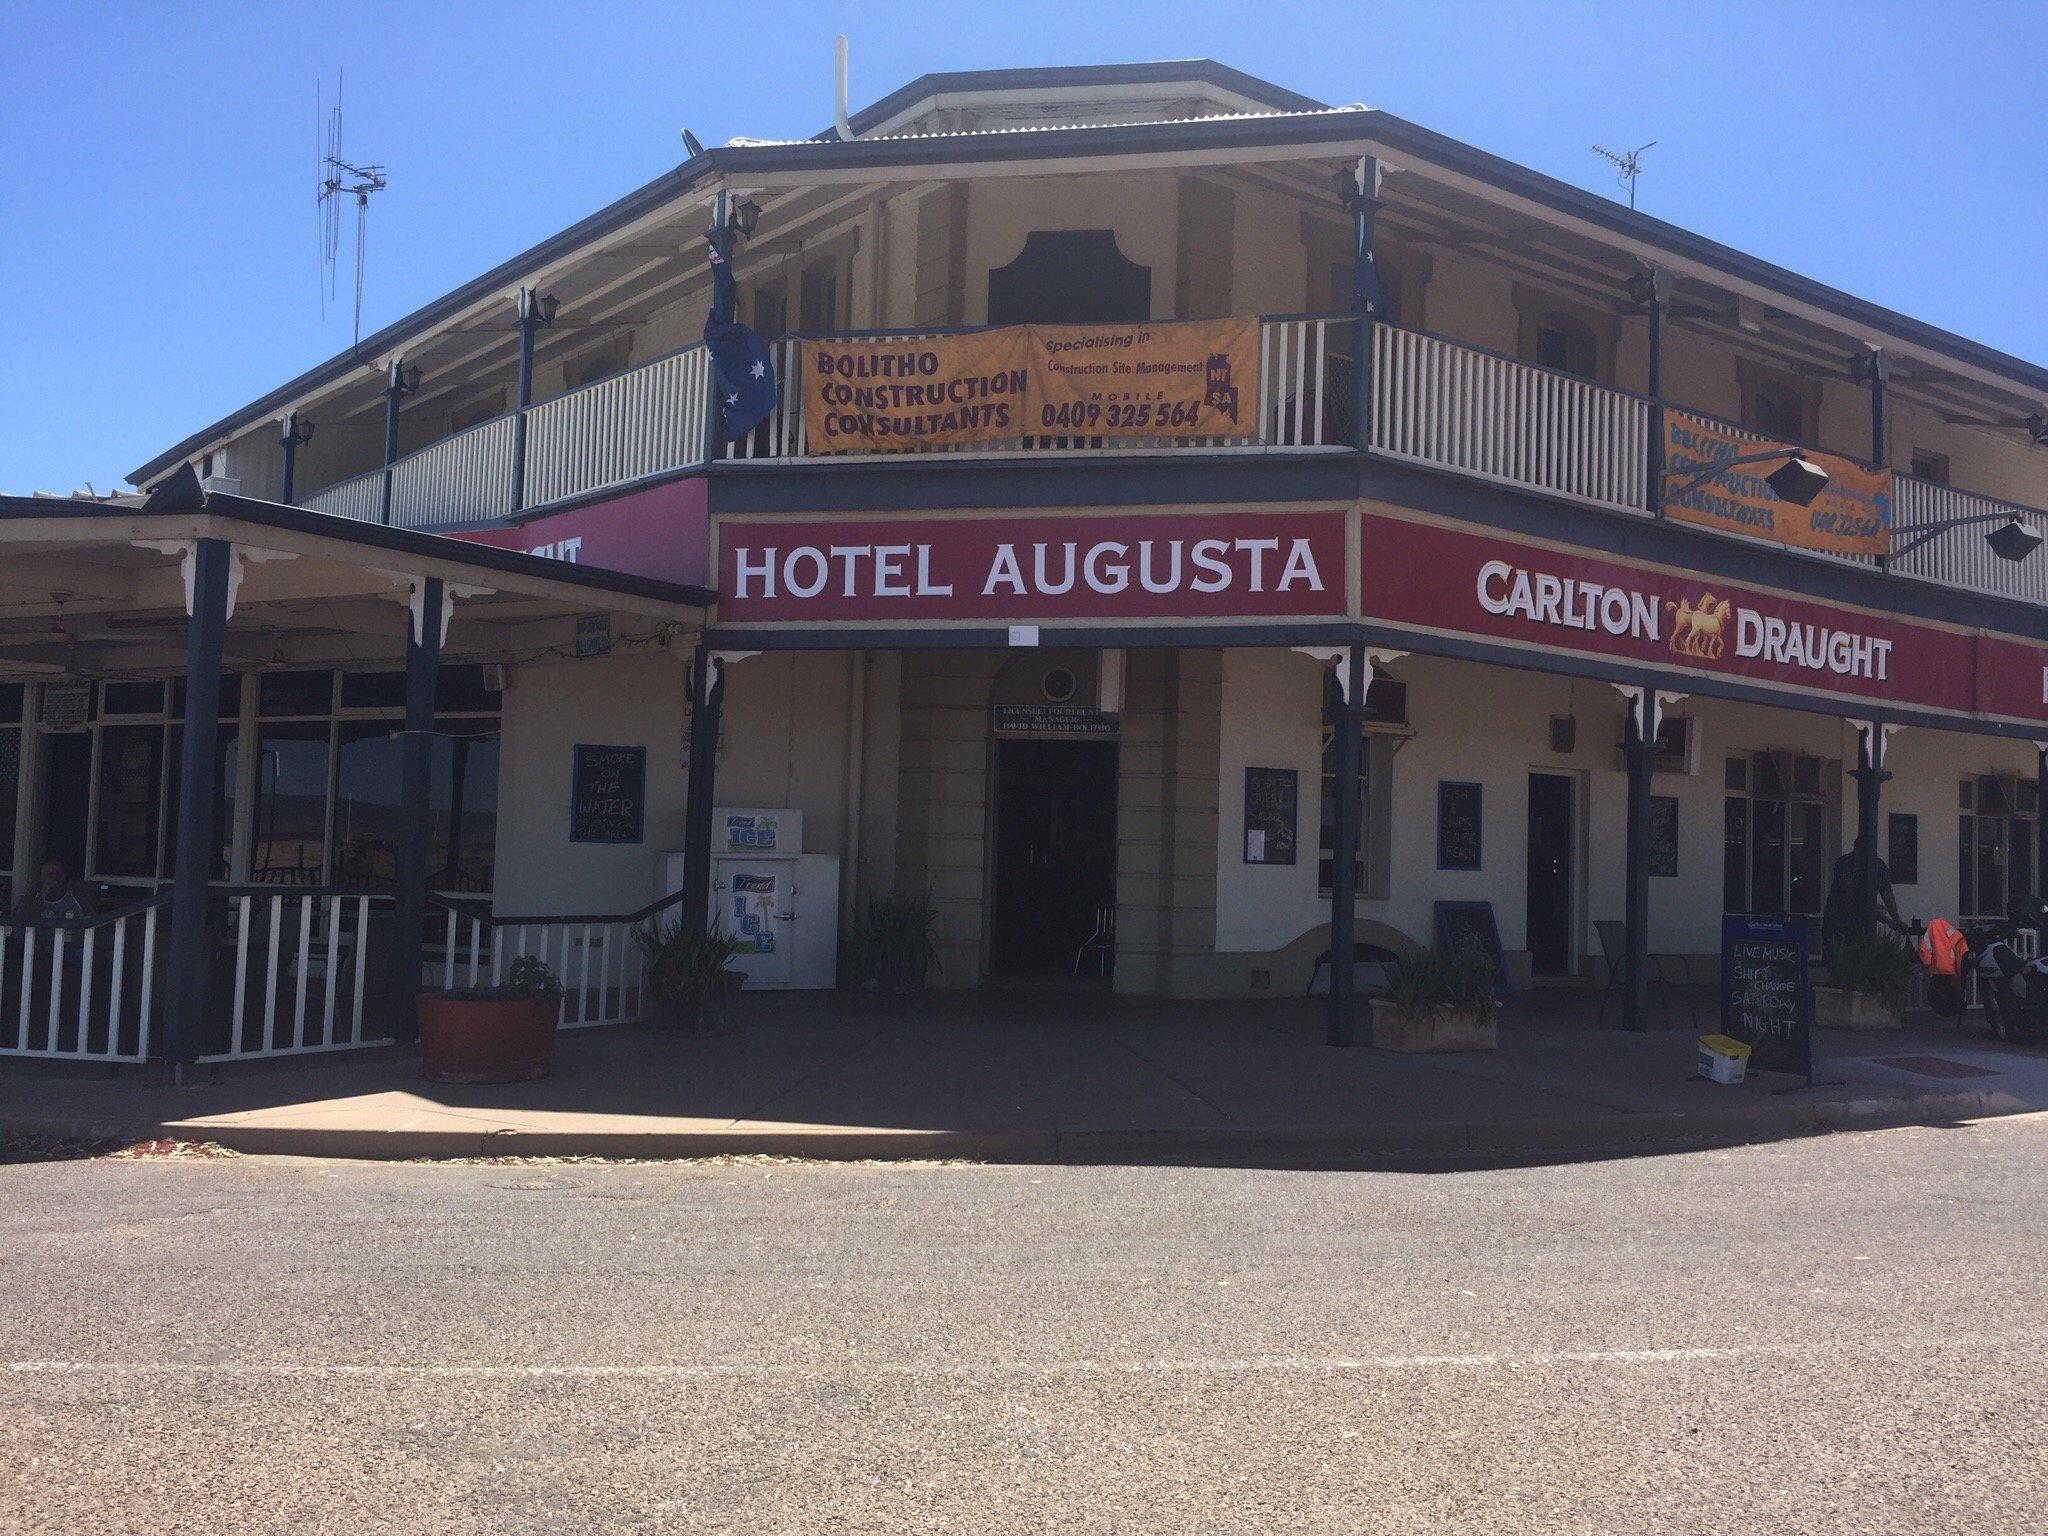 The Hotel Augusta